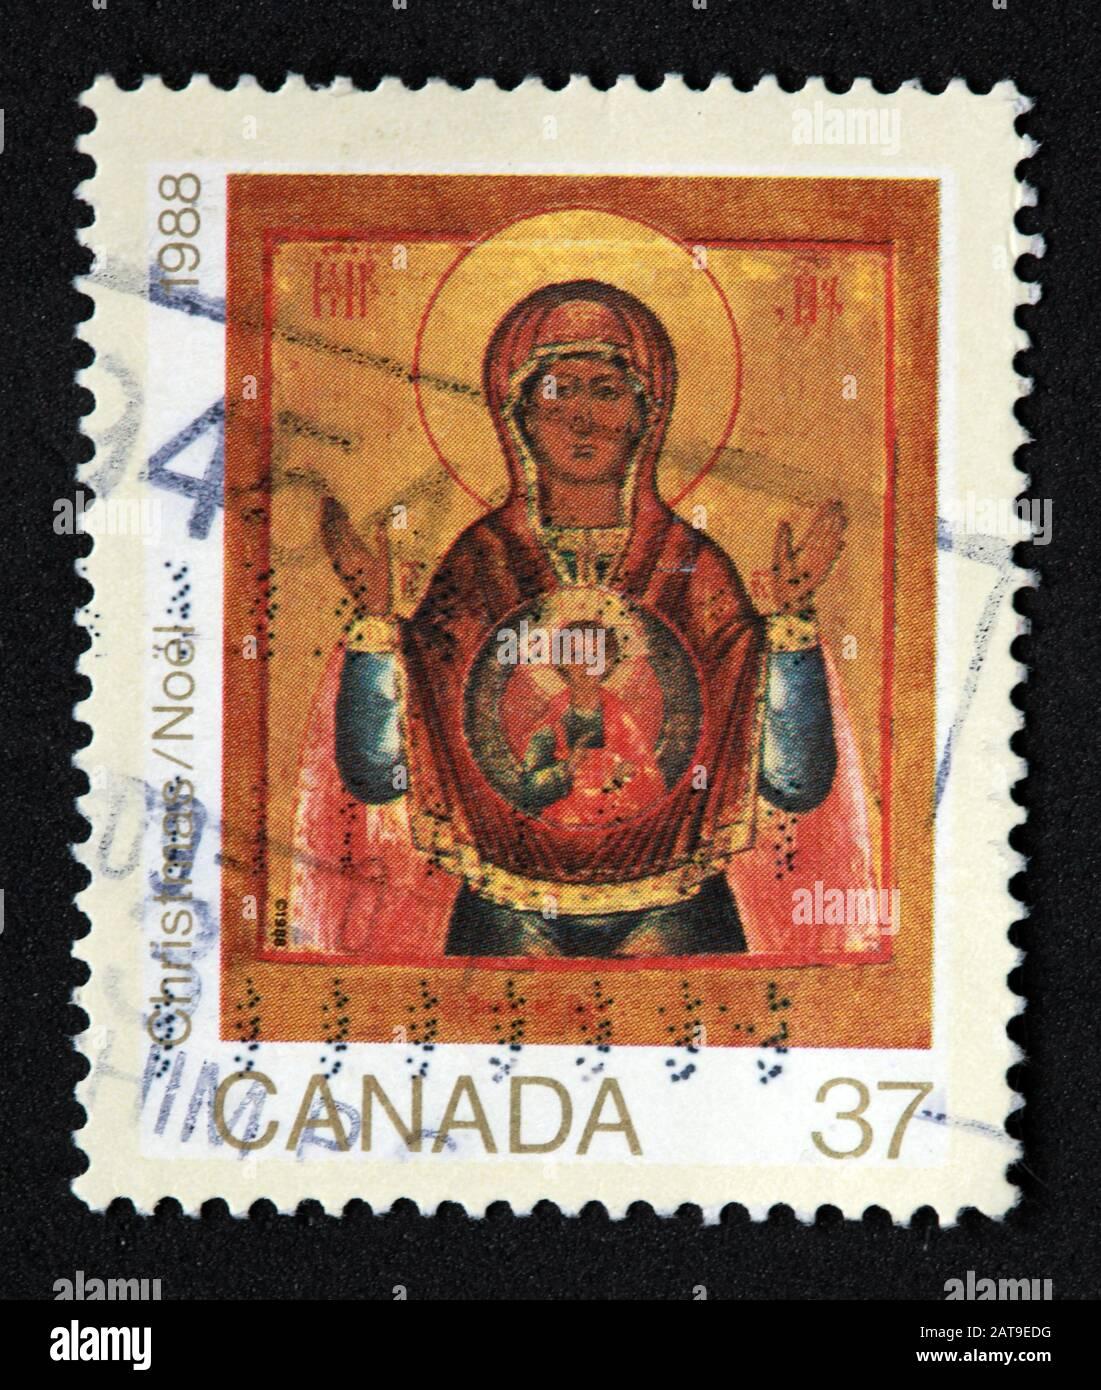 Dieses Stockfoto: Kanadische Briefmarke, Canada Stamp, Canada Post, used Stamp, Canada 37c Christmas, Xmas, 1988, Angel, Christ, Stamp - 2AT9ED